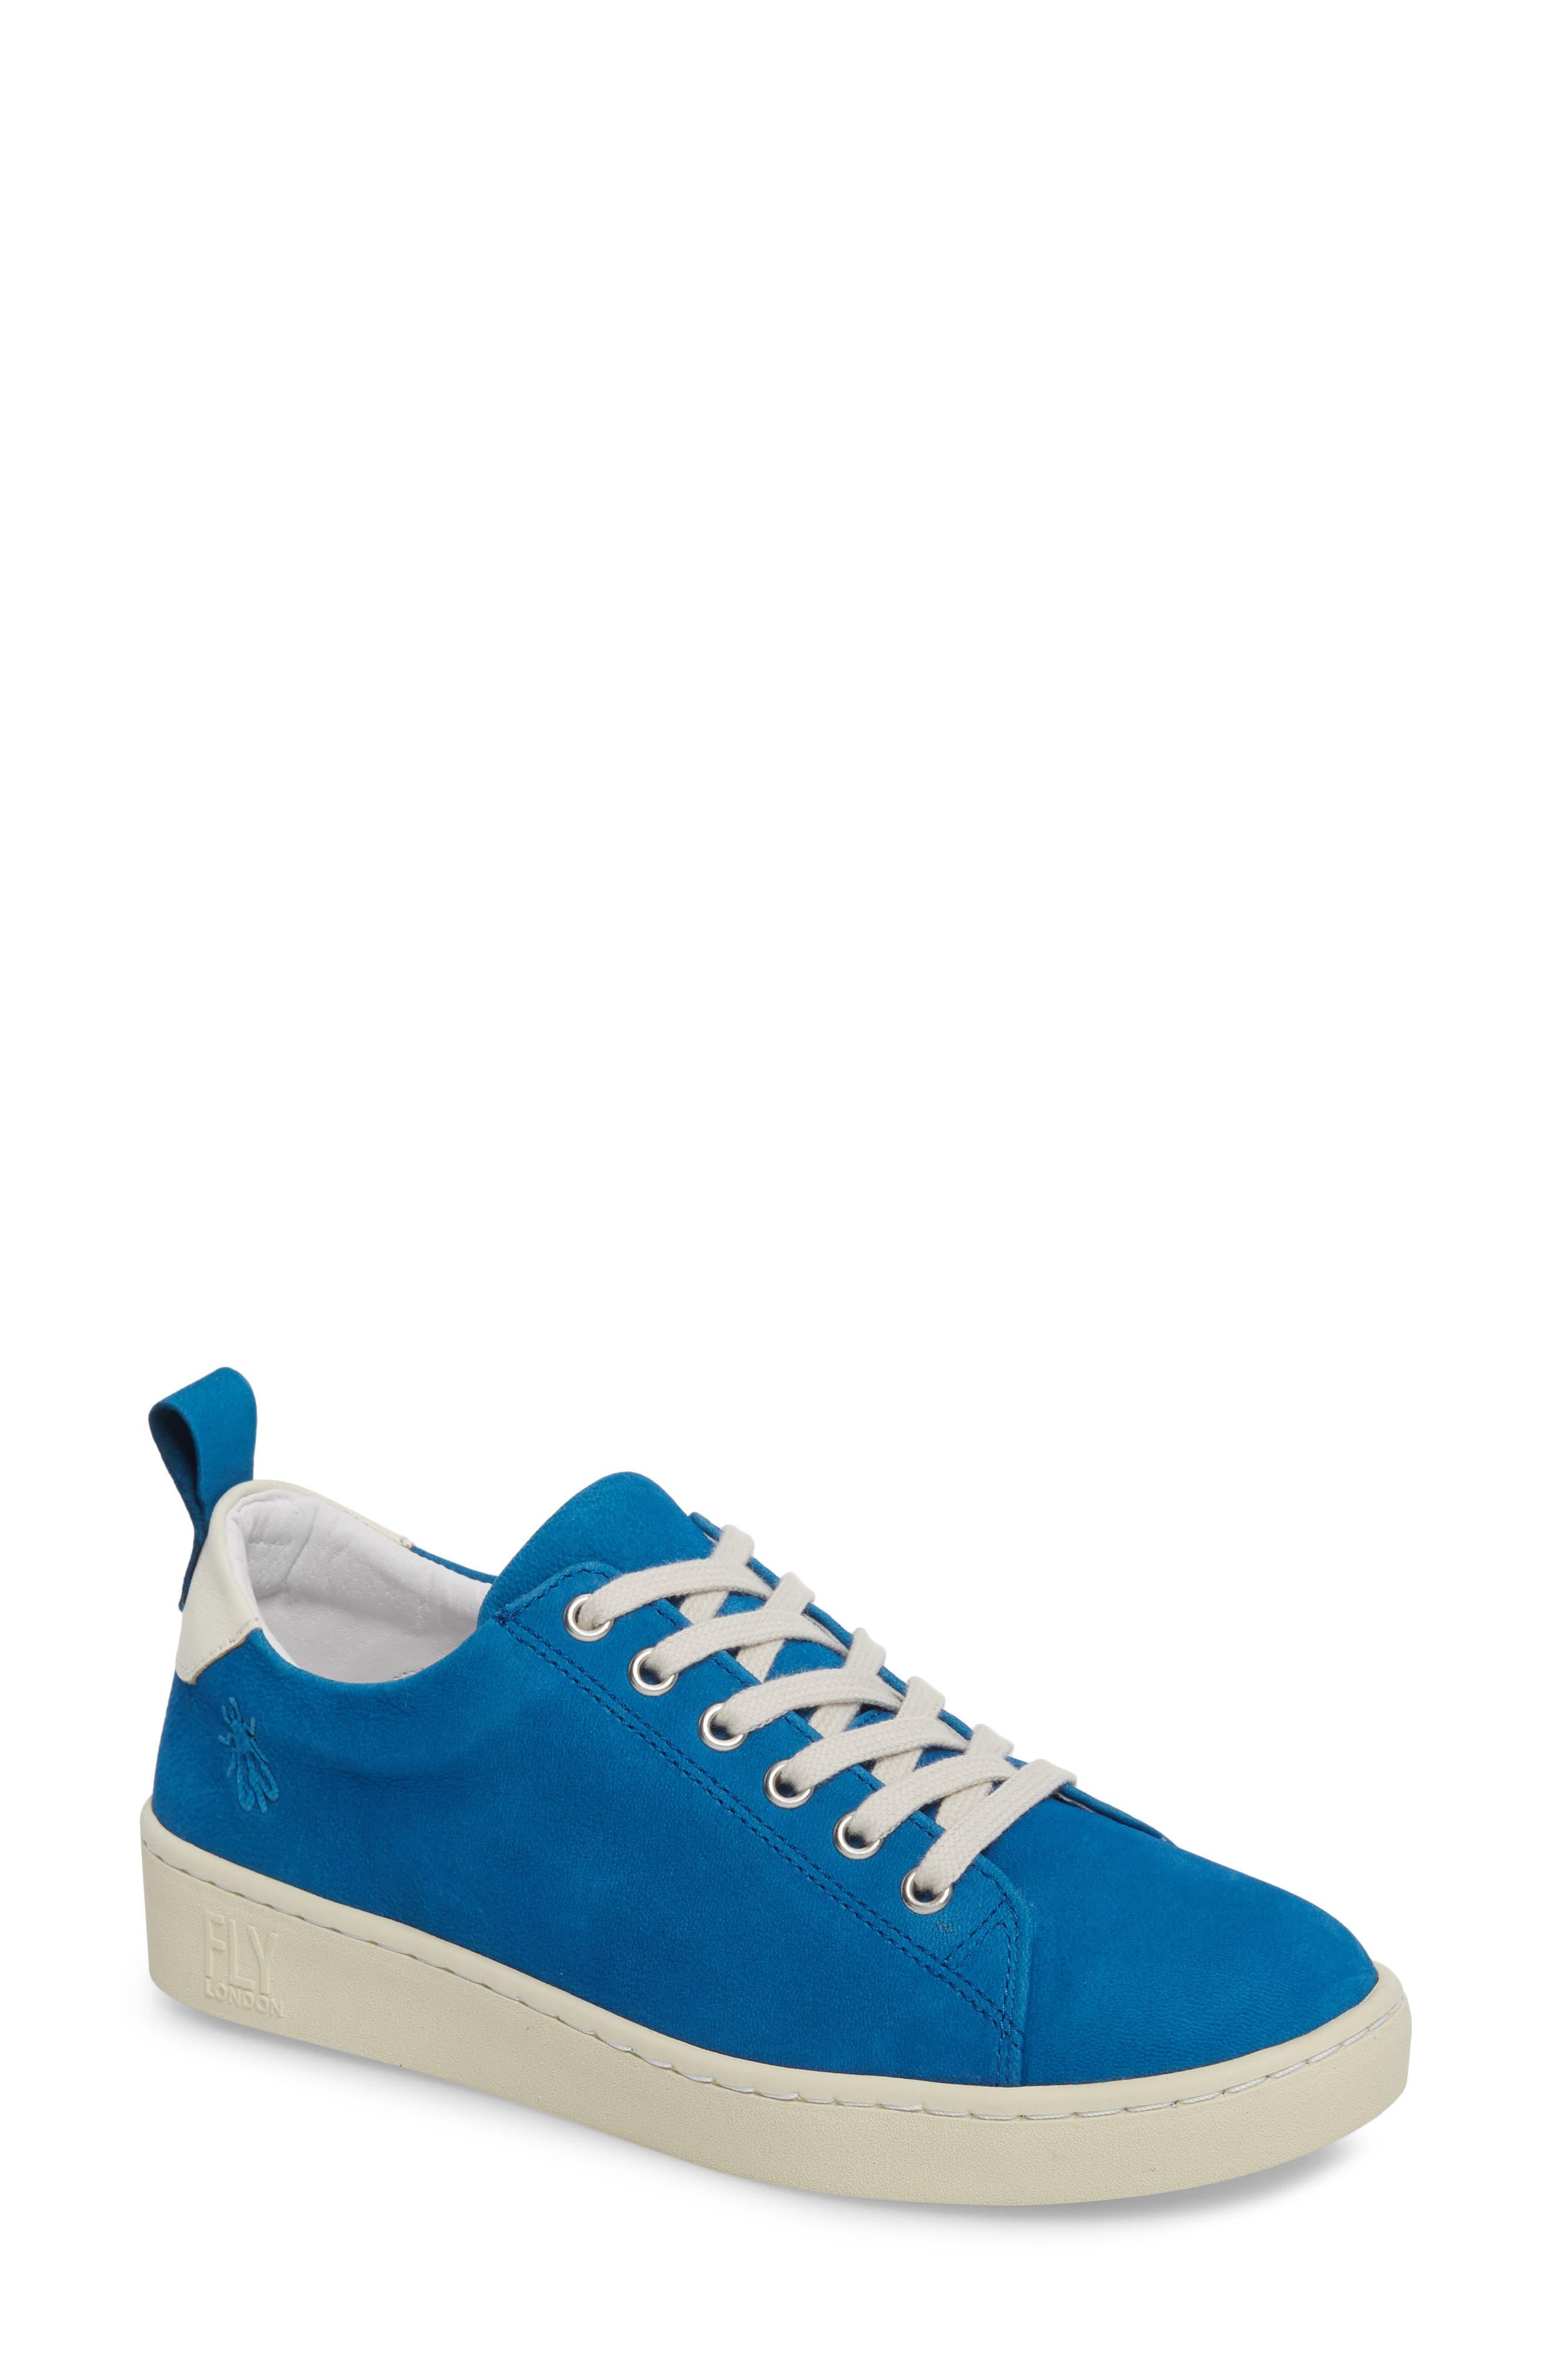 Fly London Maku Lace-Up Sneaker - Blue